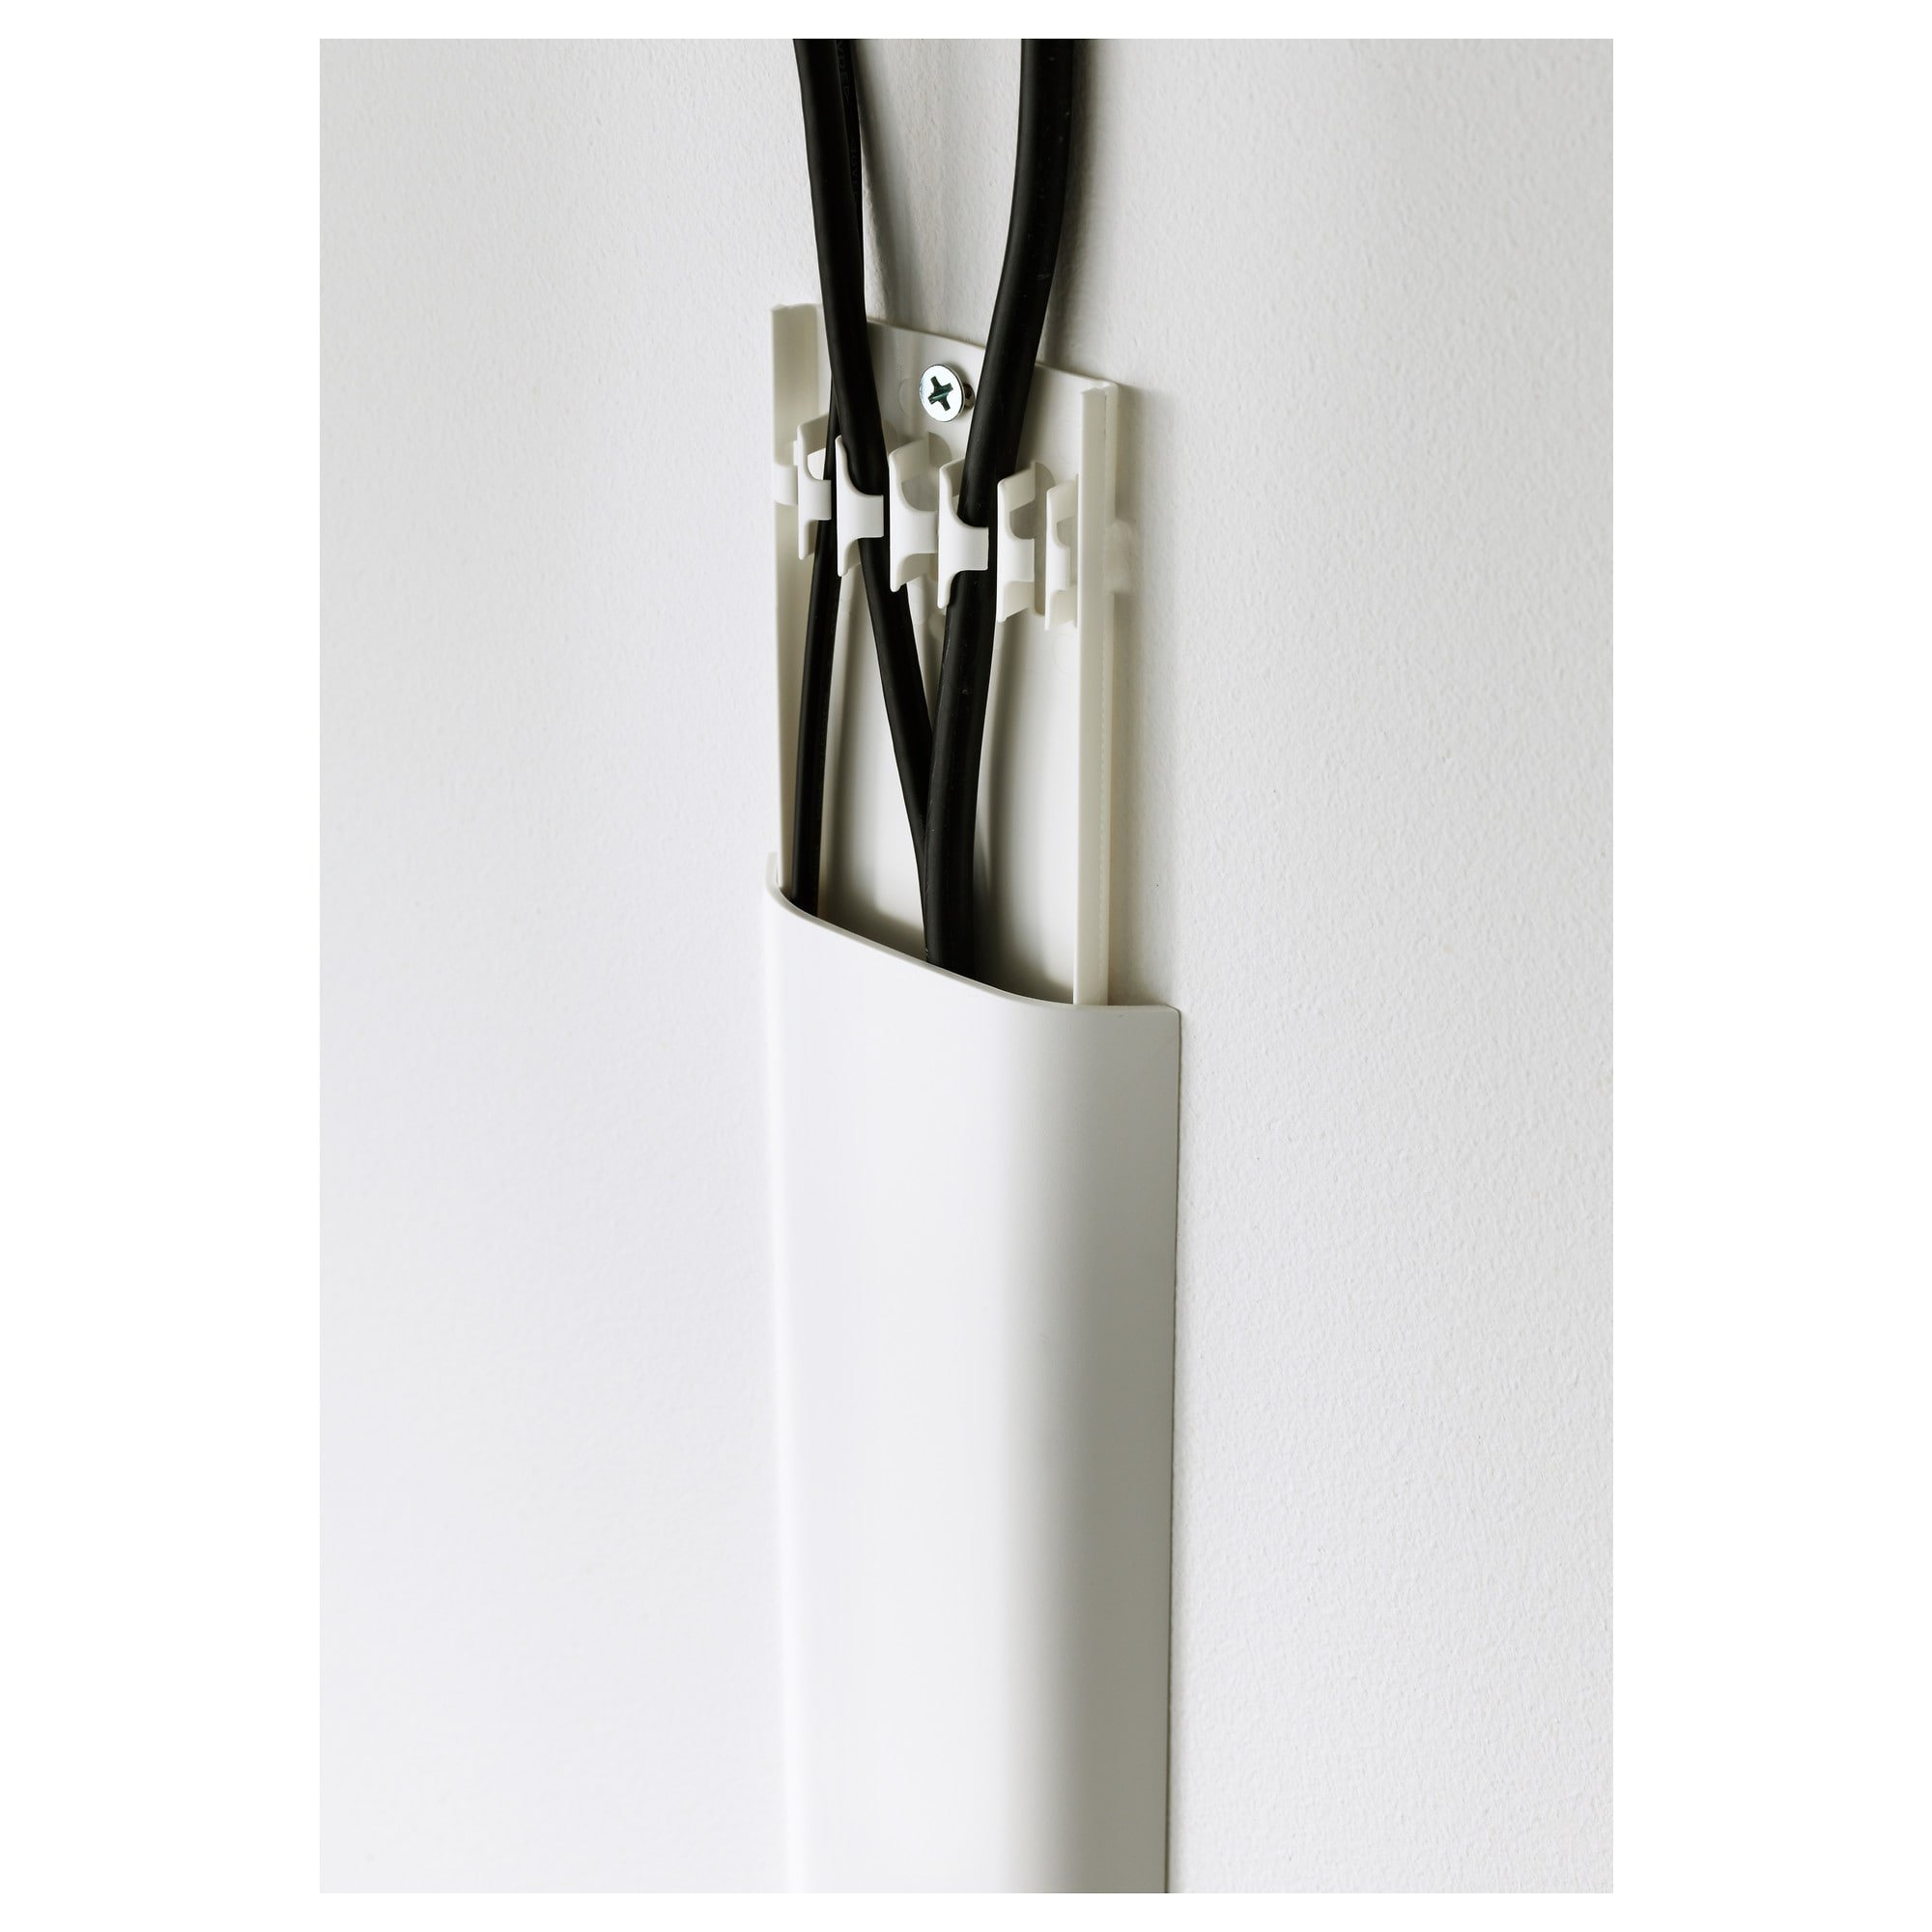 ikea UPPLEVA Cable cover strip, white